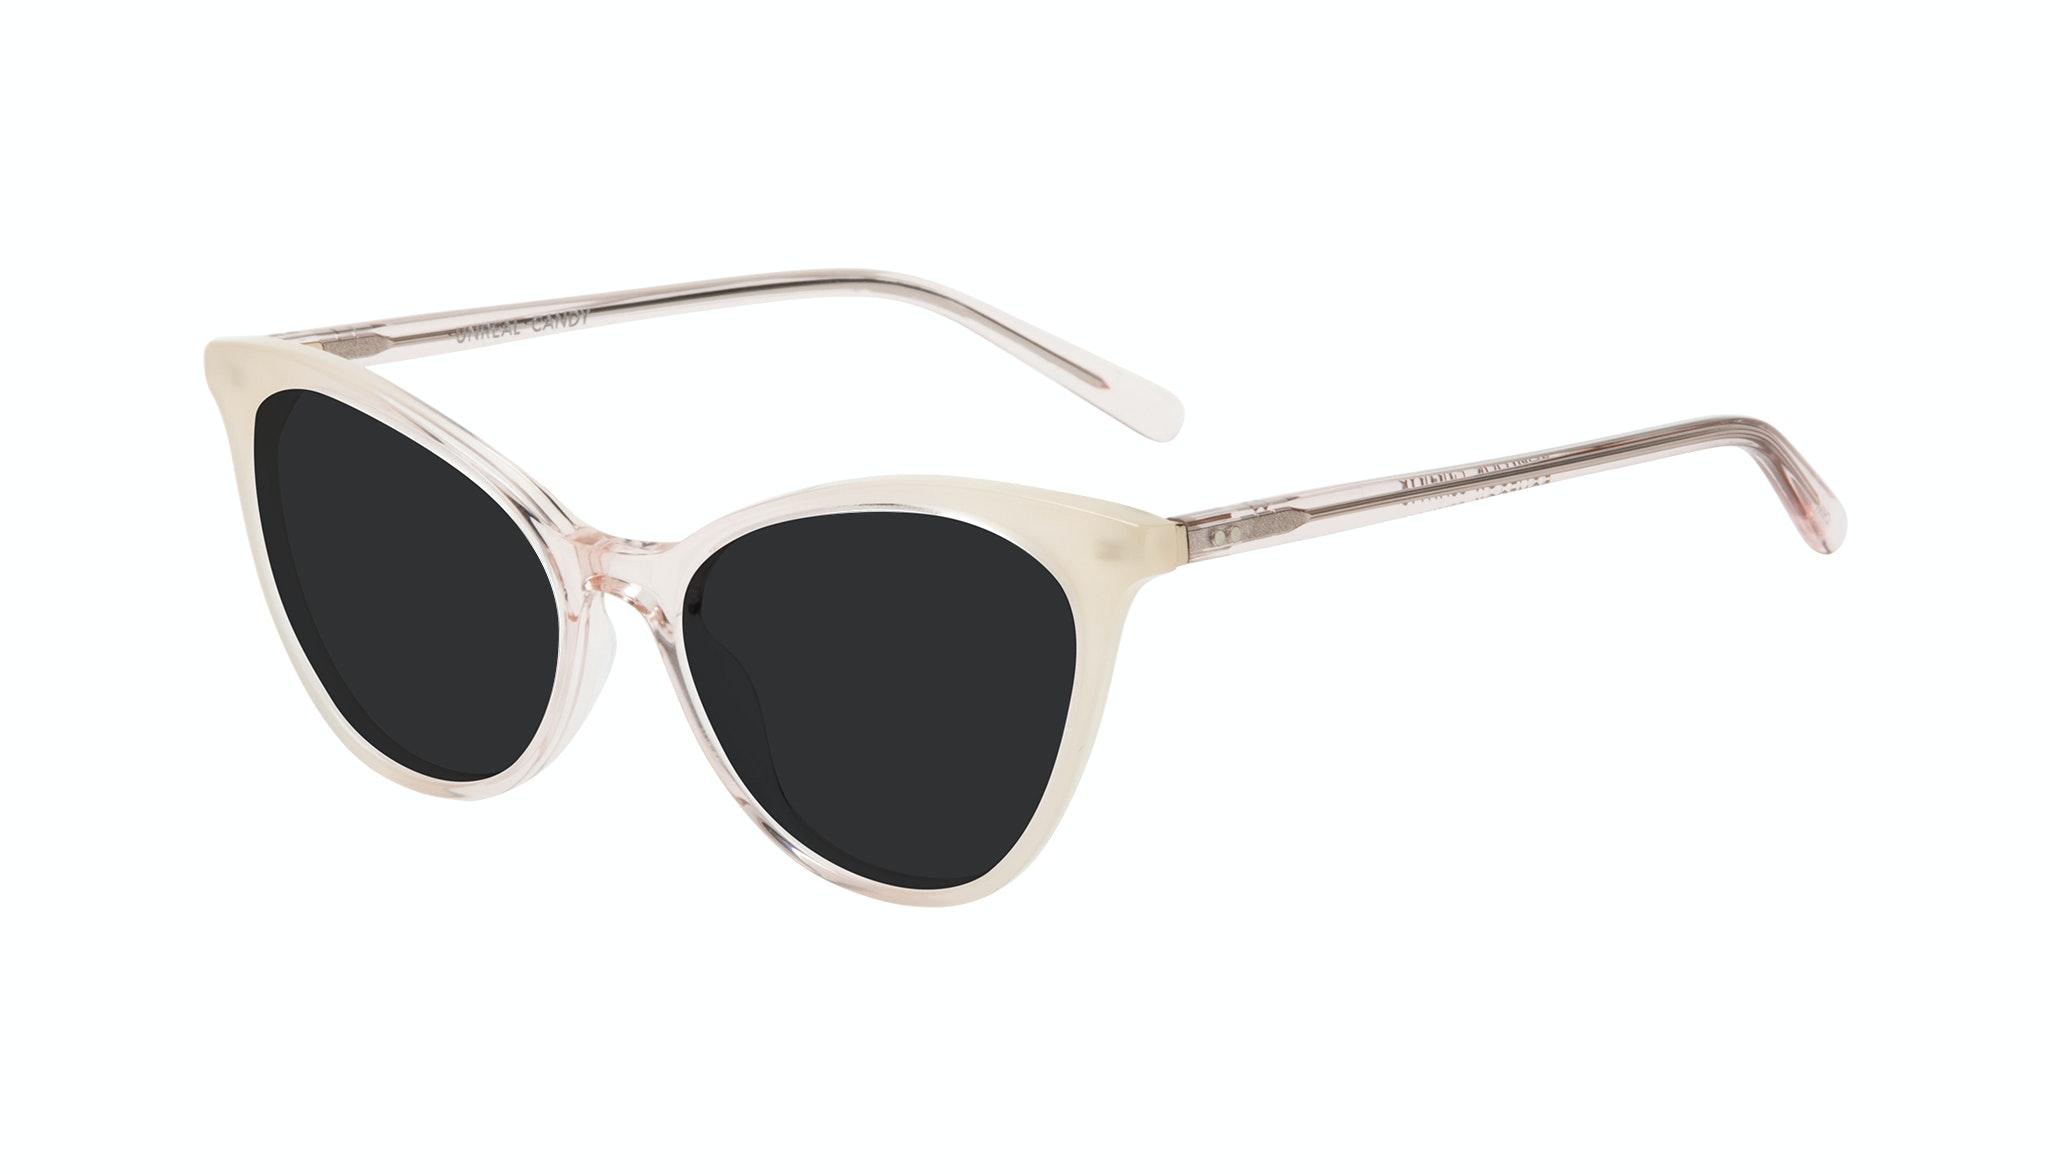 Affordable Fashion Glasses Cat Eye Sunglasses Women Unreal Candy Tilt